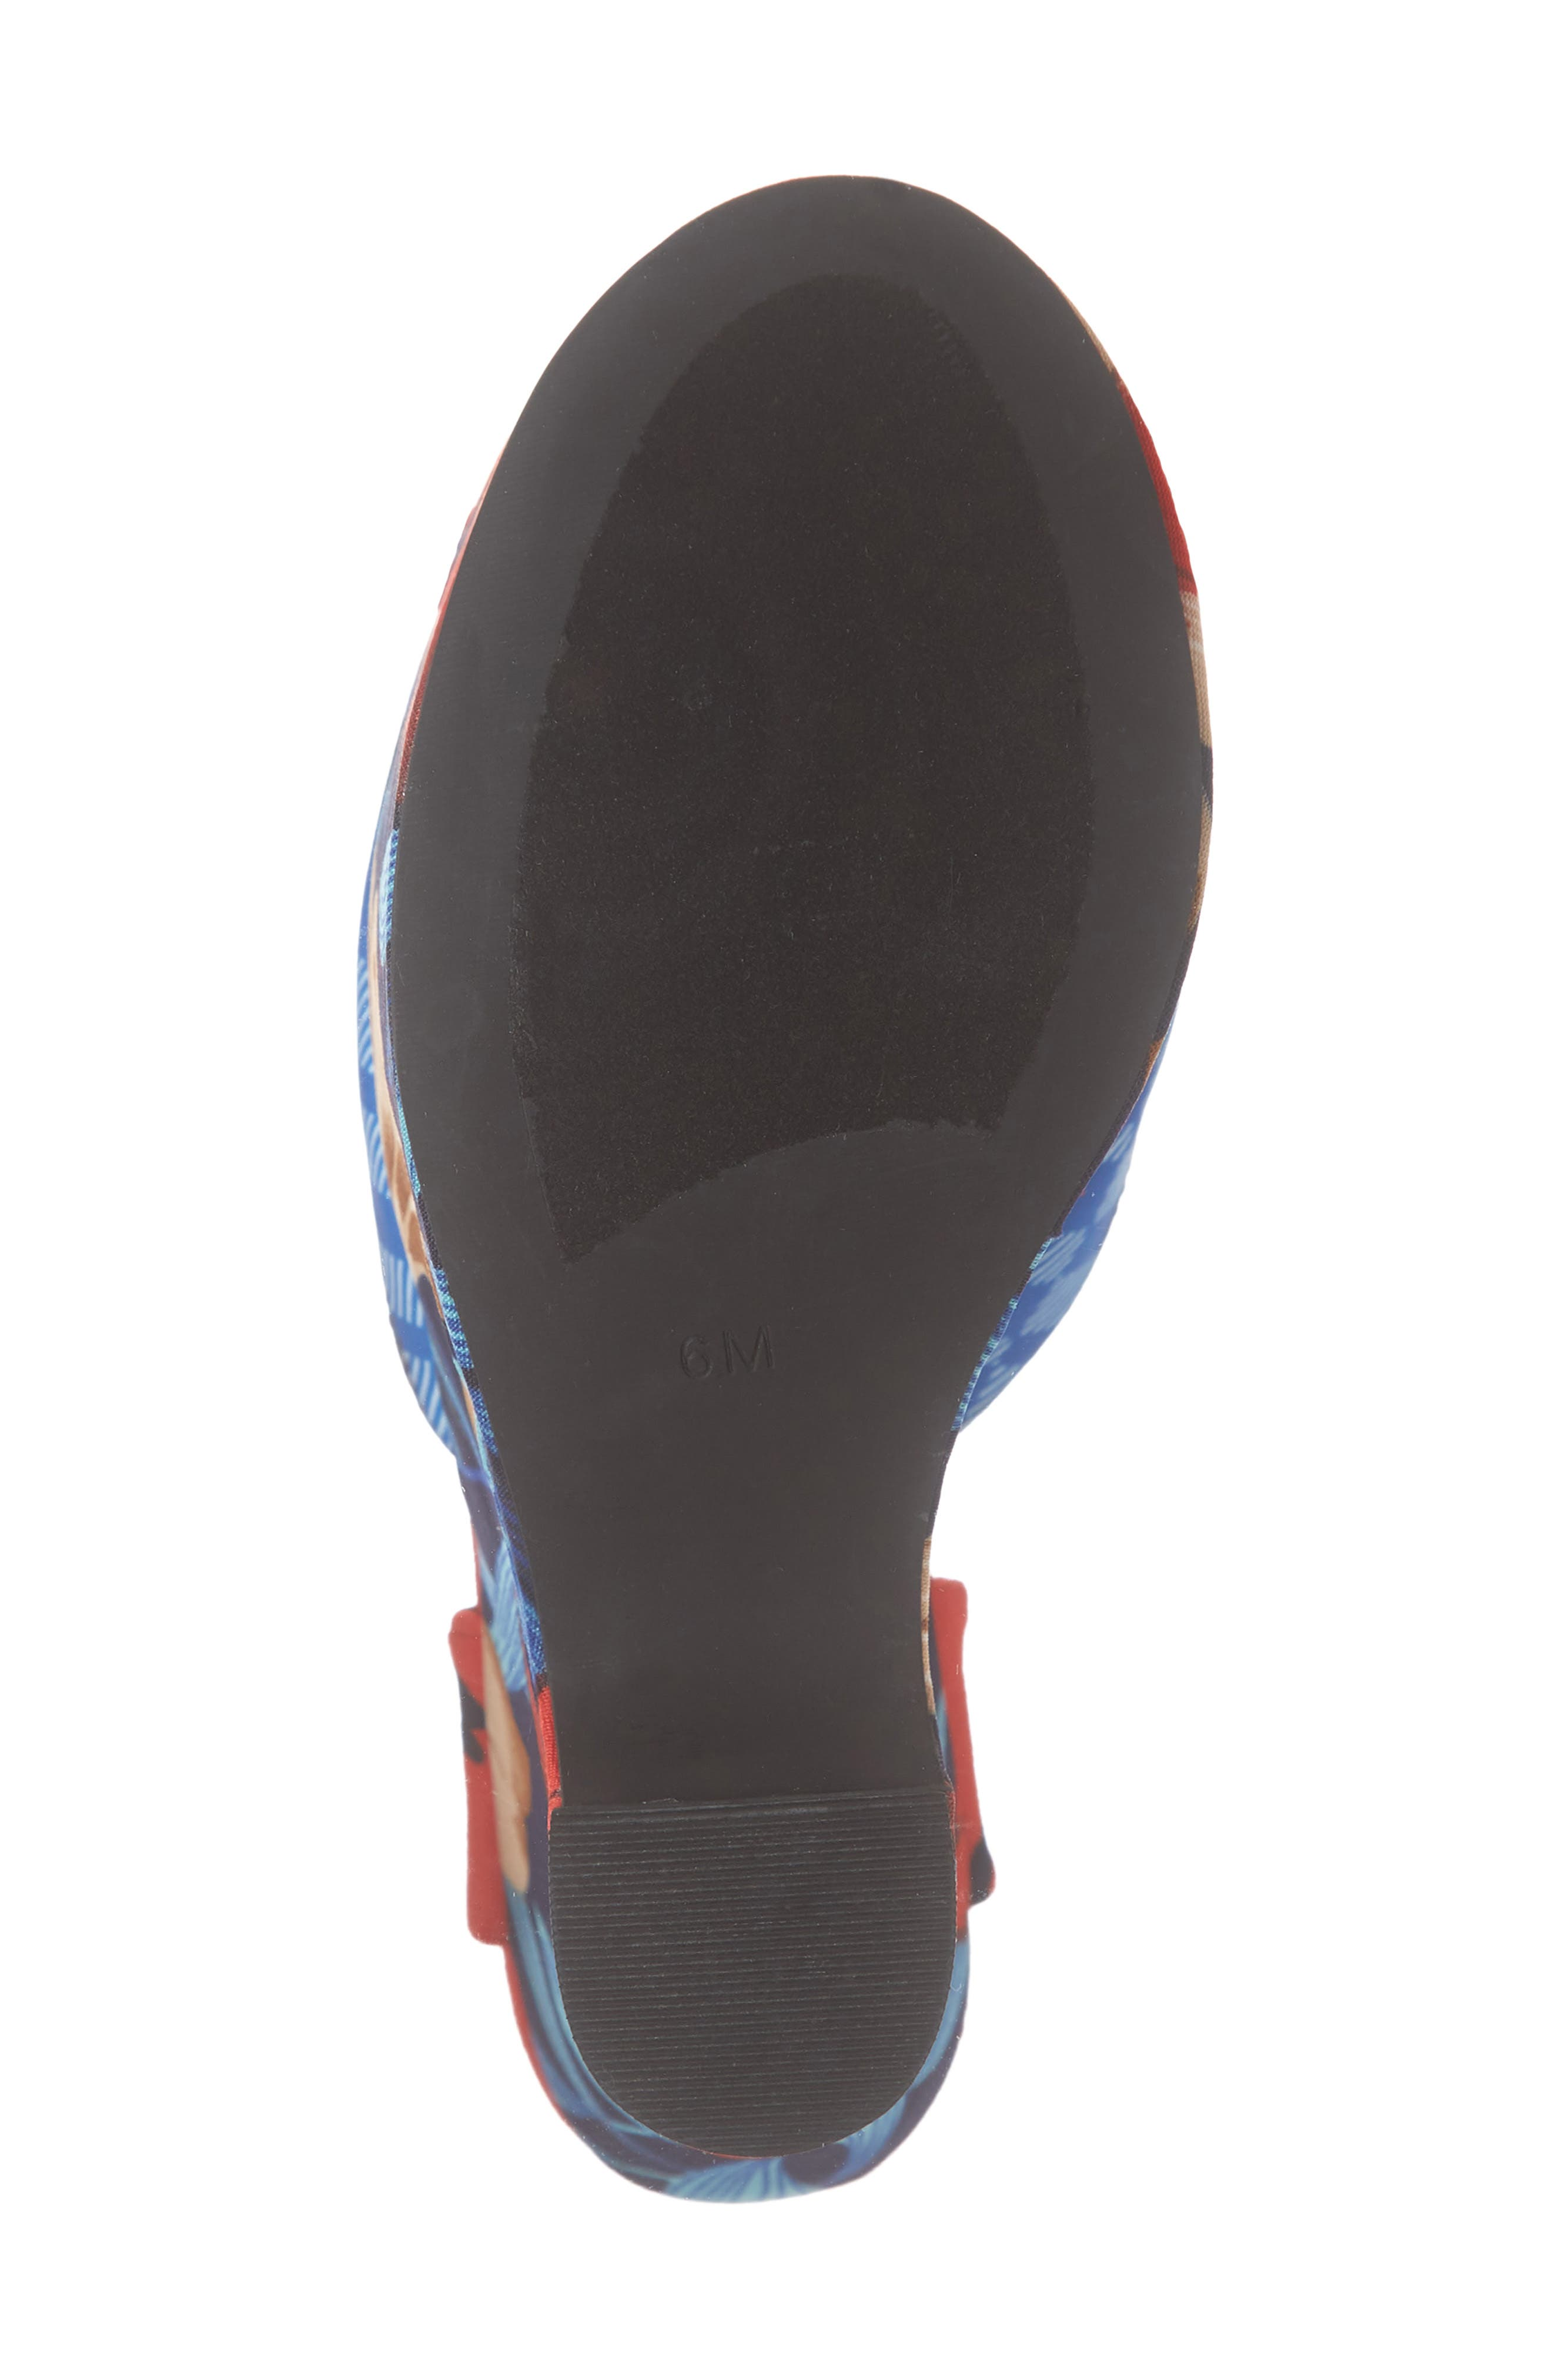 JEFFREY CAMPBELL, Kendra Platform Wedge Sandal, Alternate thumbnail 6, color, 642